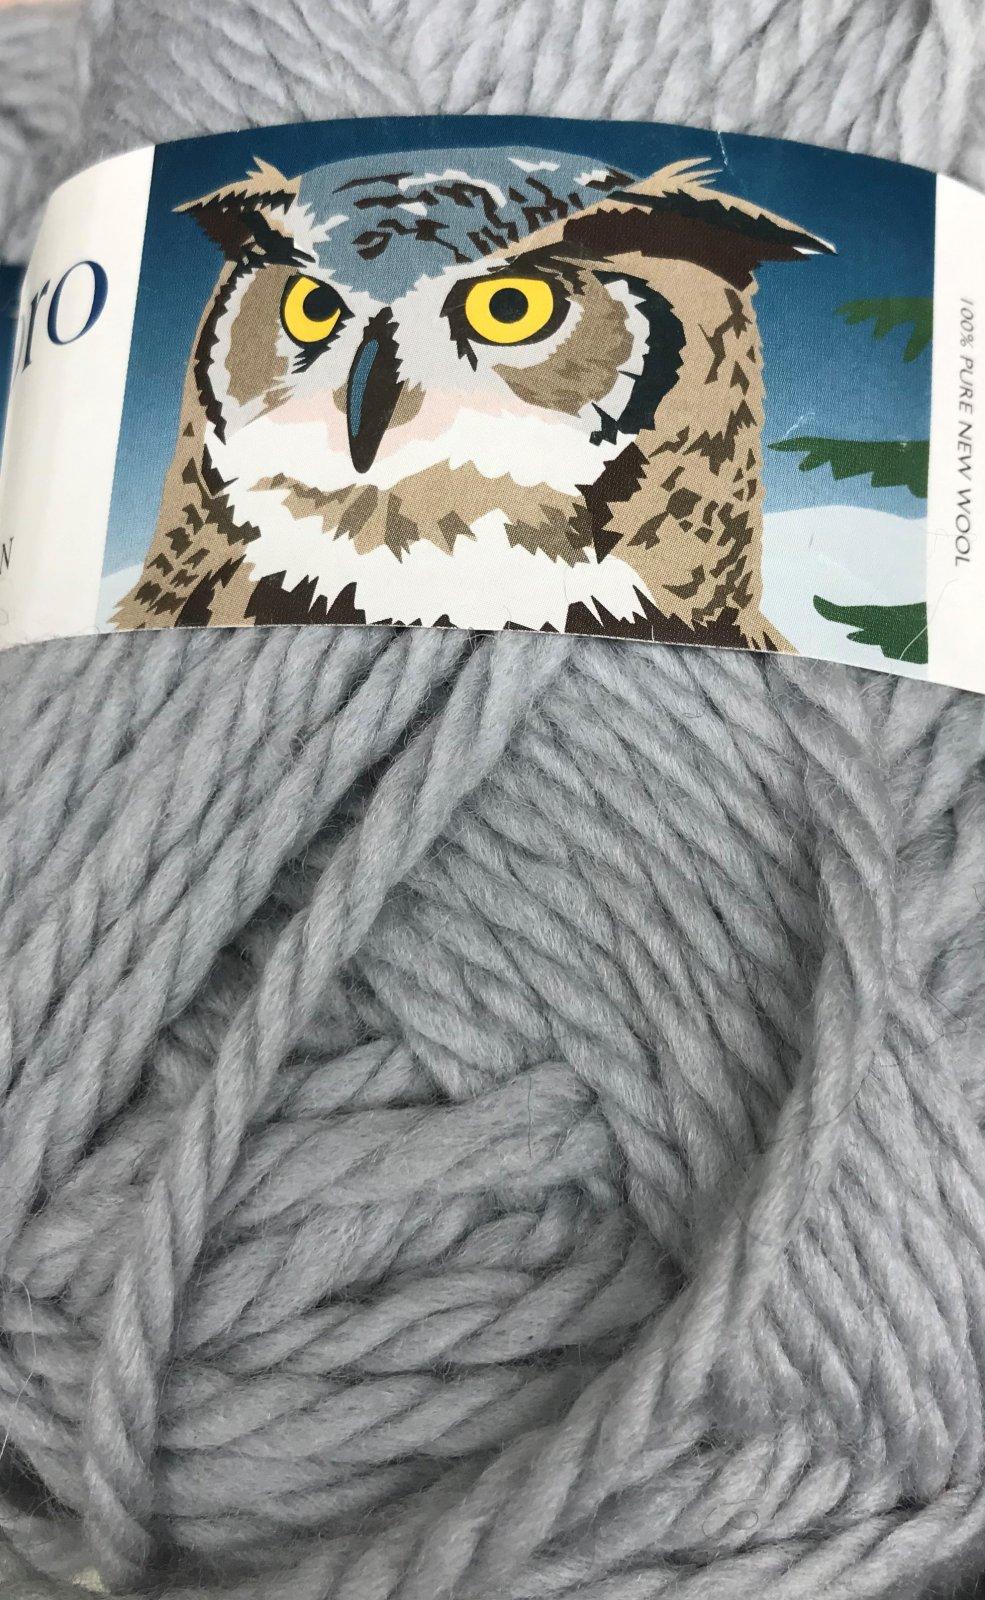 Grey 5630 Hubro Norway 100% wool 72y, 2.5sts=1on #9mm